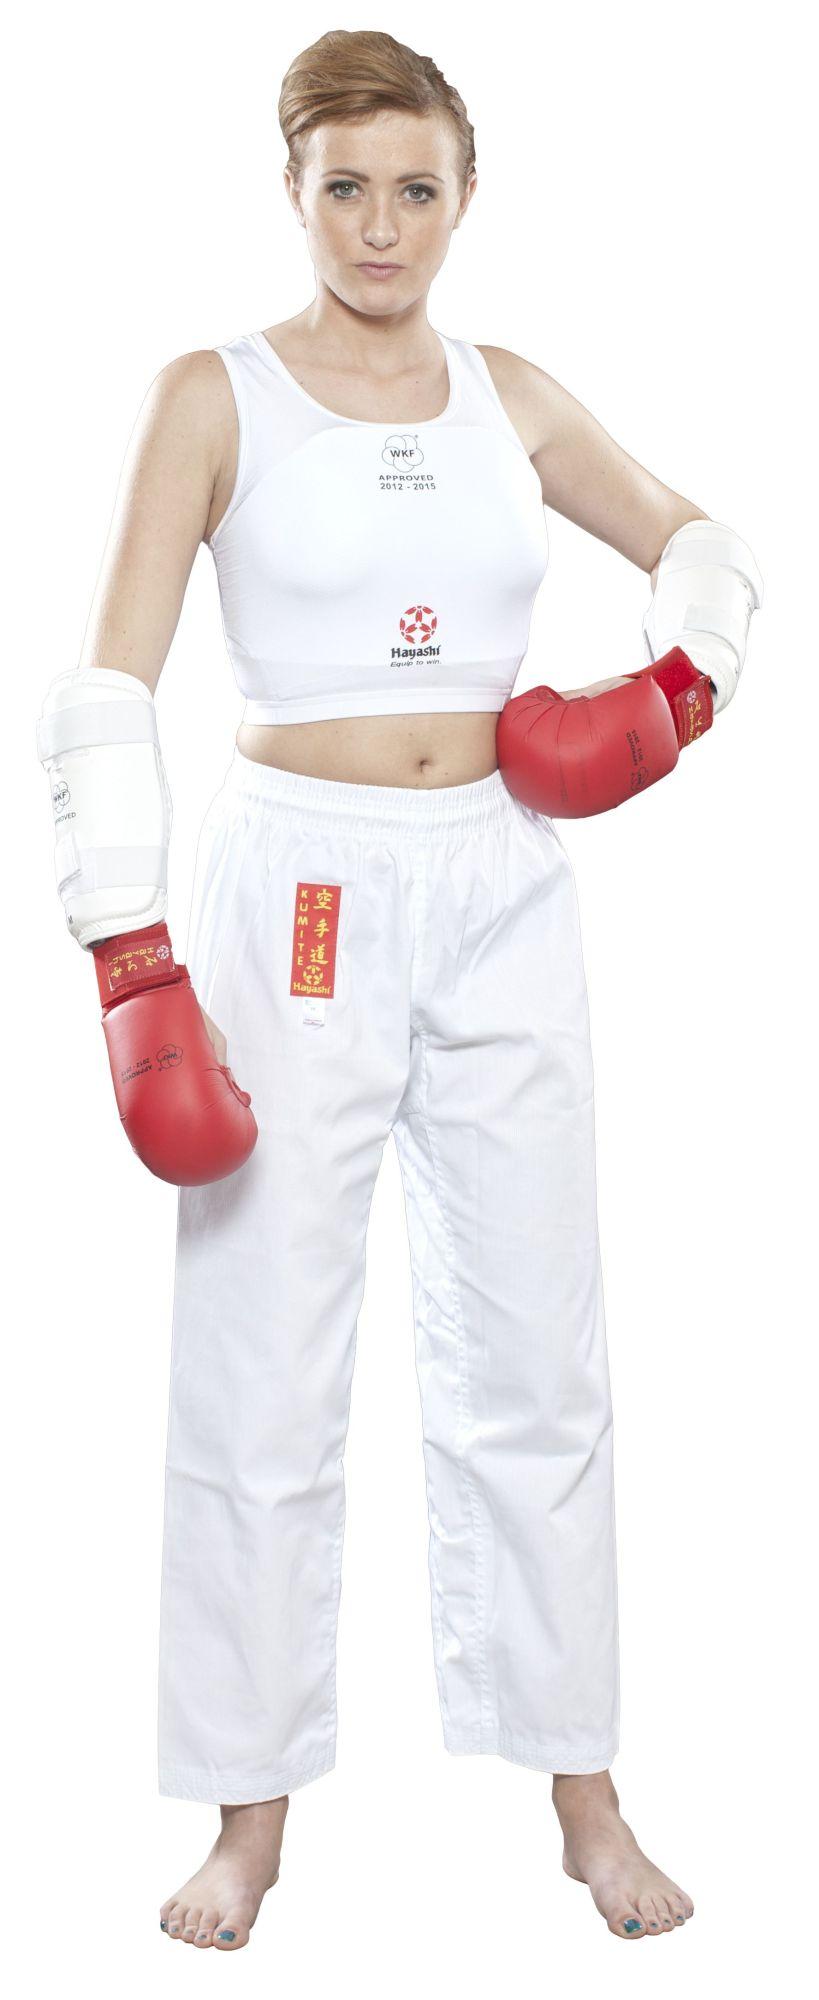 "Hayashi Borstbeschermer ""Maxi"" voor dames (WKF Approved) Wit"